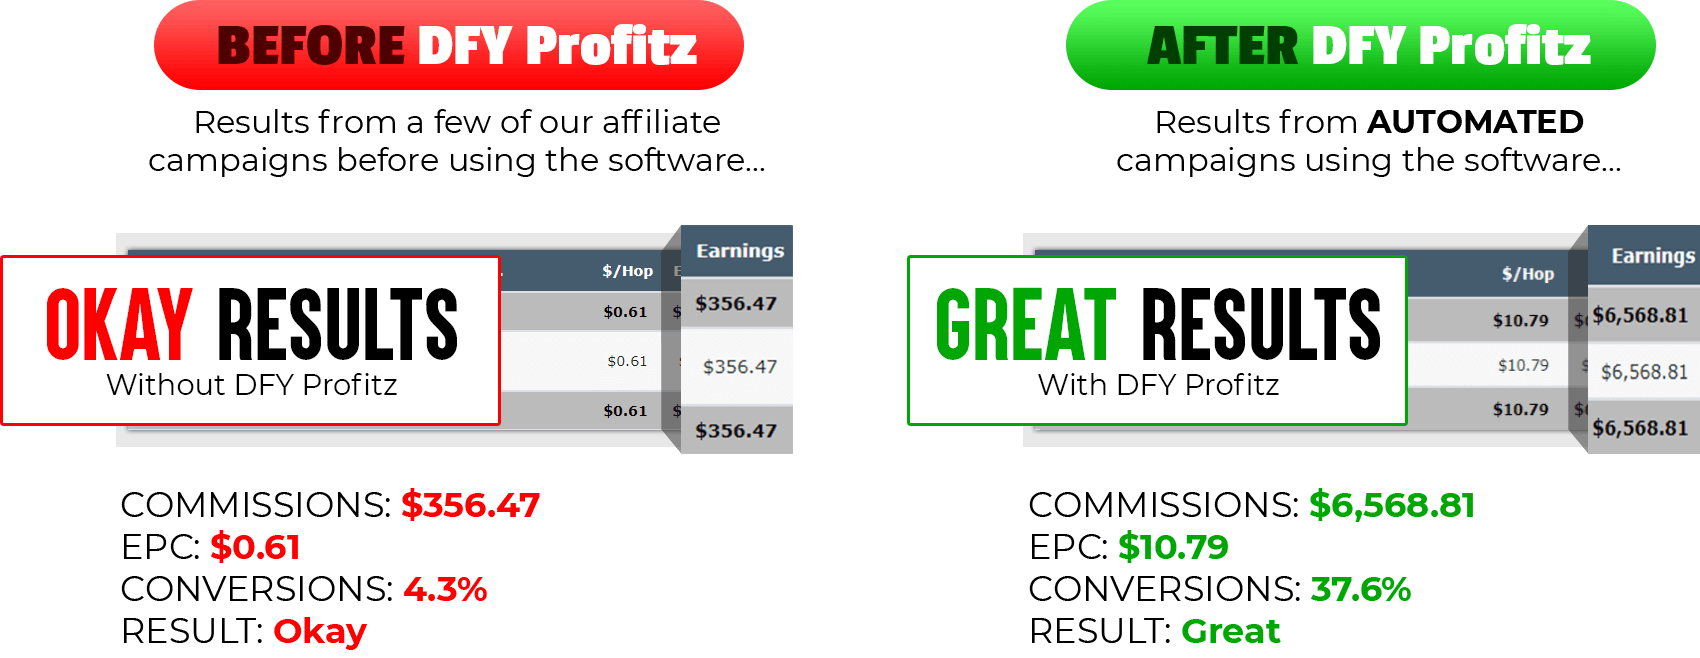 DFY Profitz Results